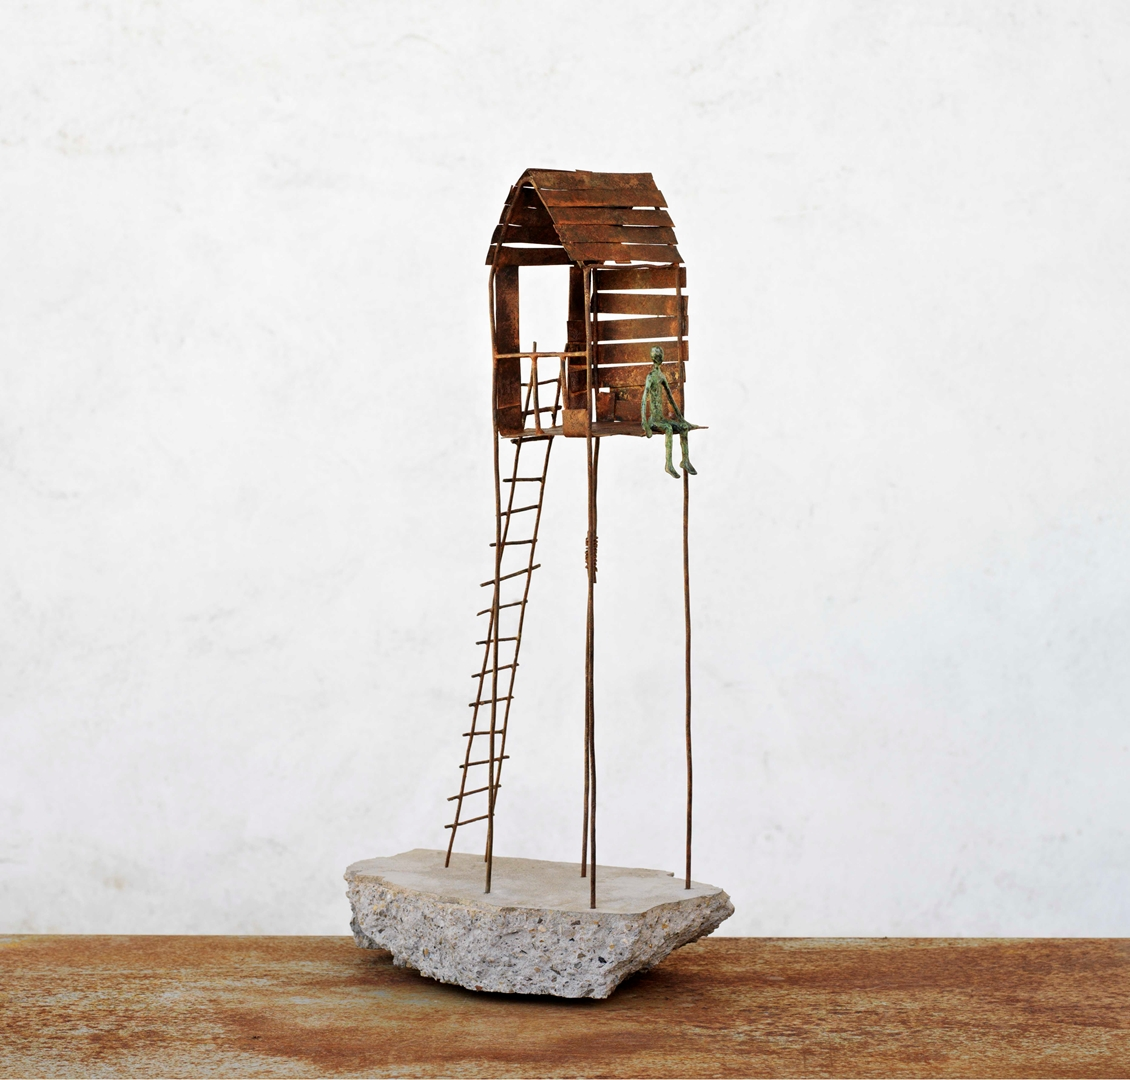 alonso-marquez-arte-abierto-casa-decor (Copy)